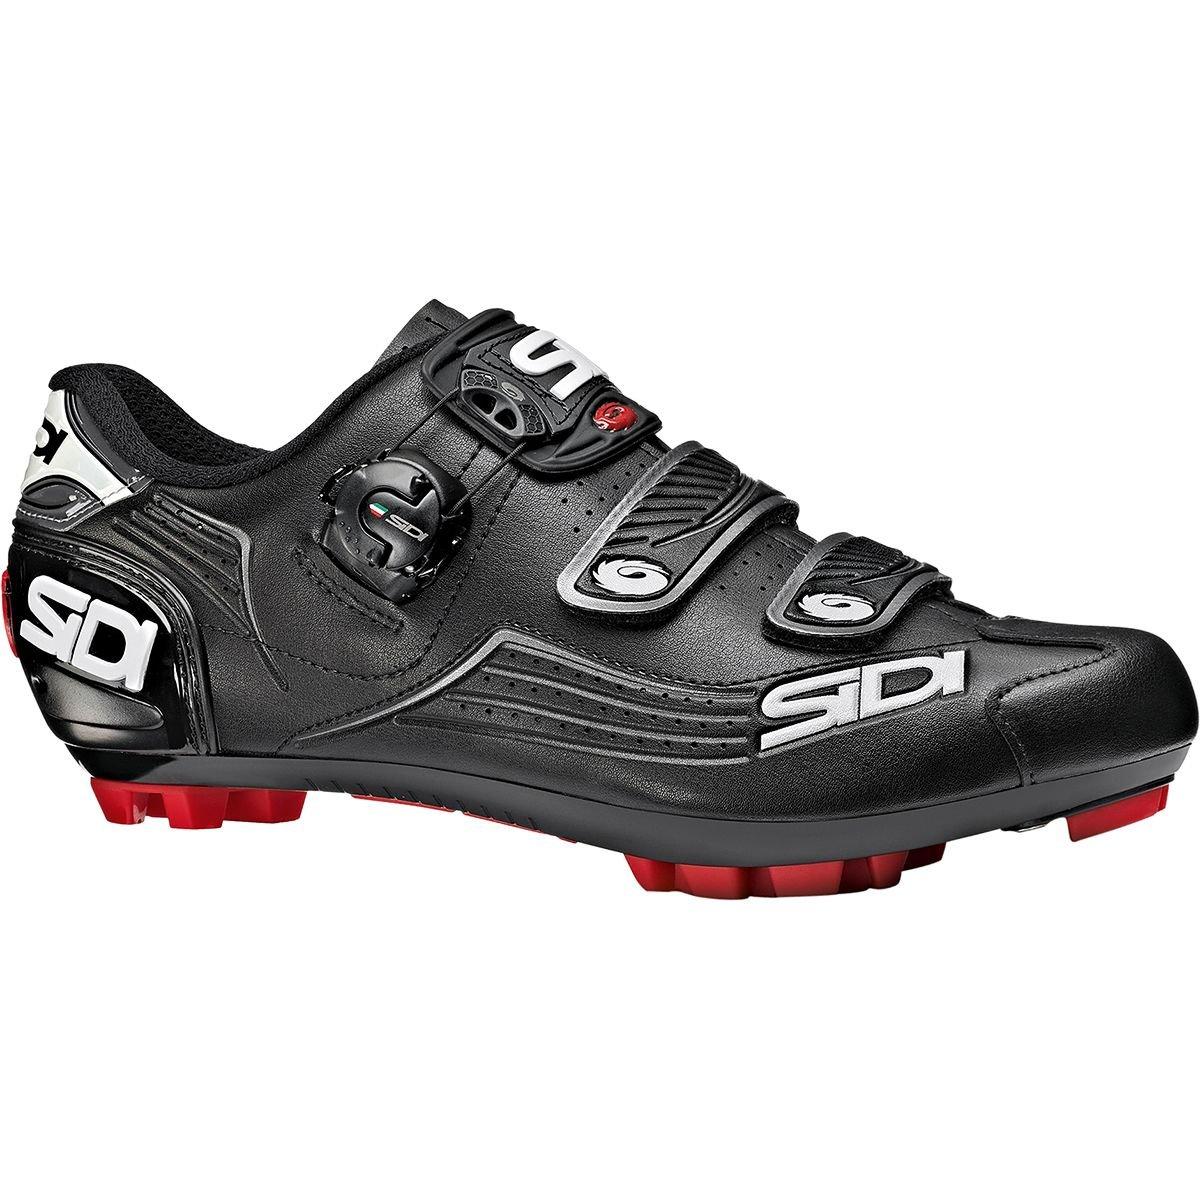 Sidi Trace Mountain Bike MTB Bicycle Shoes Black (39)